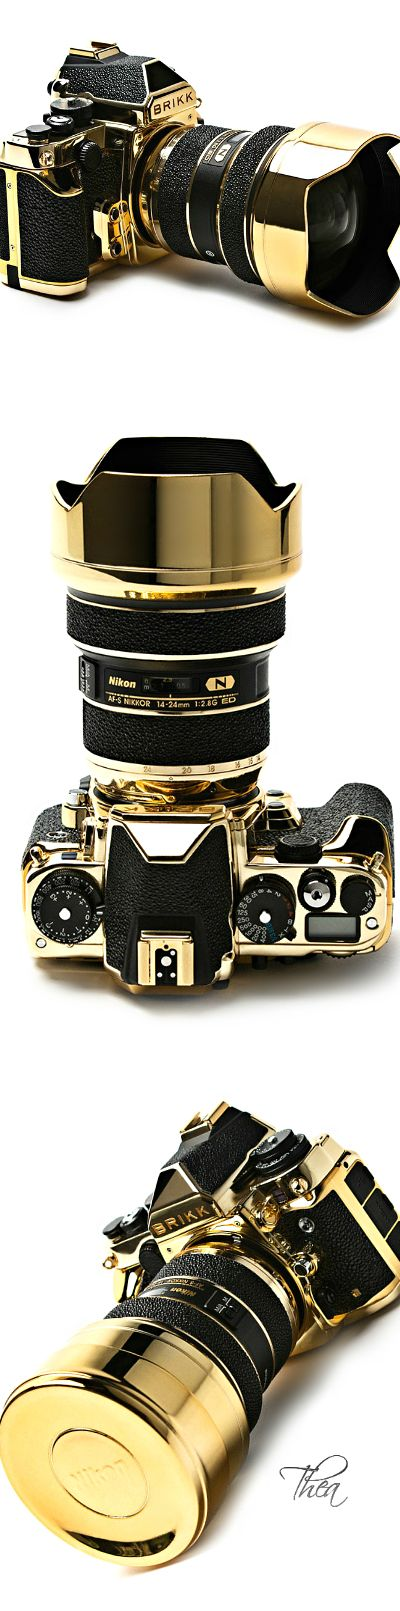 Brikk  ● 24K Gold & Stingray Lux Nikon DF Camera $58,000